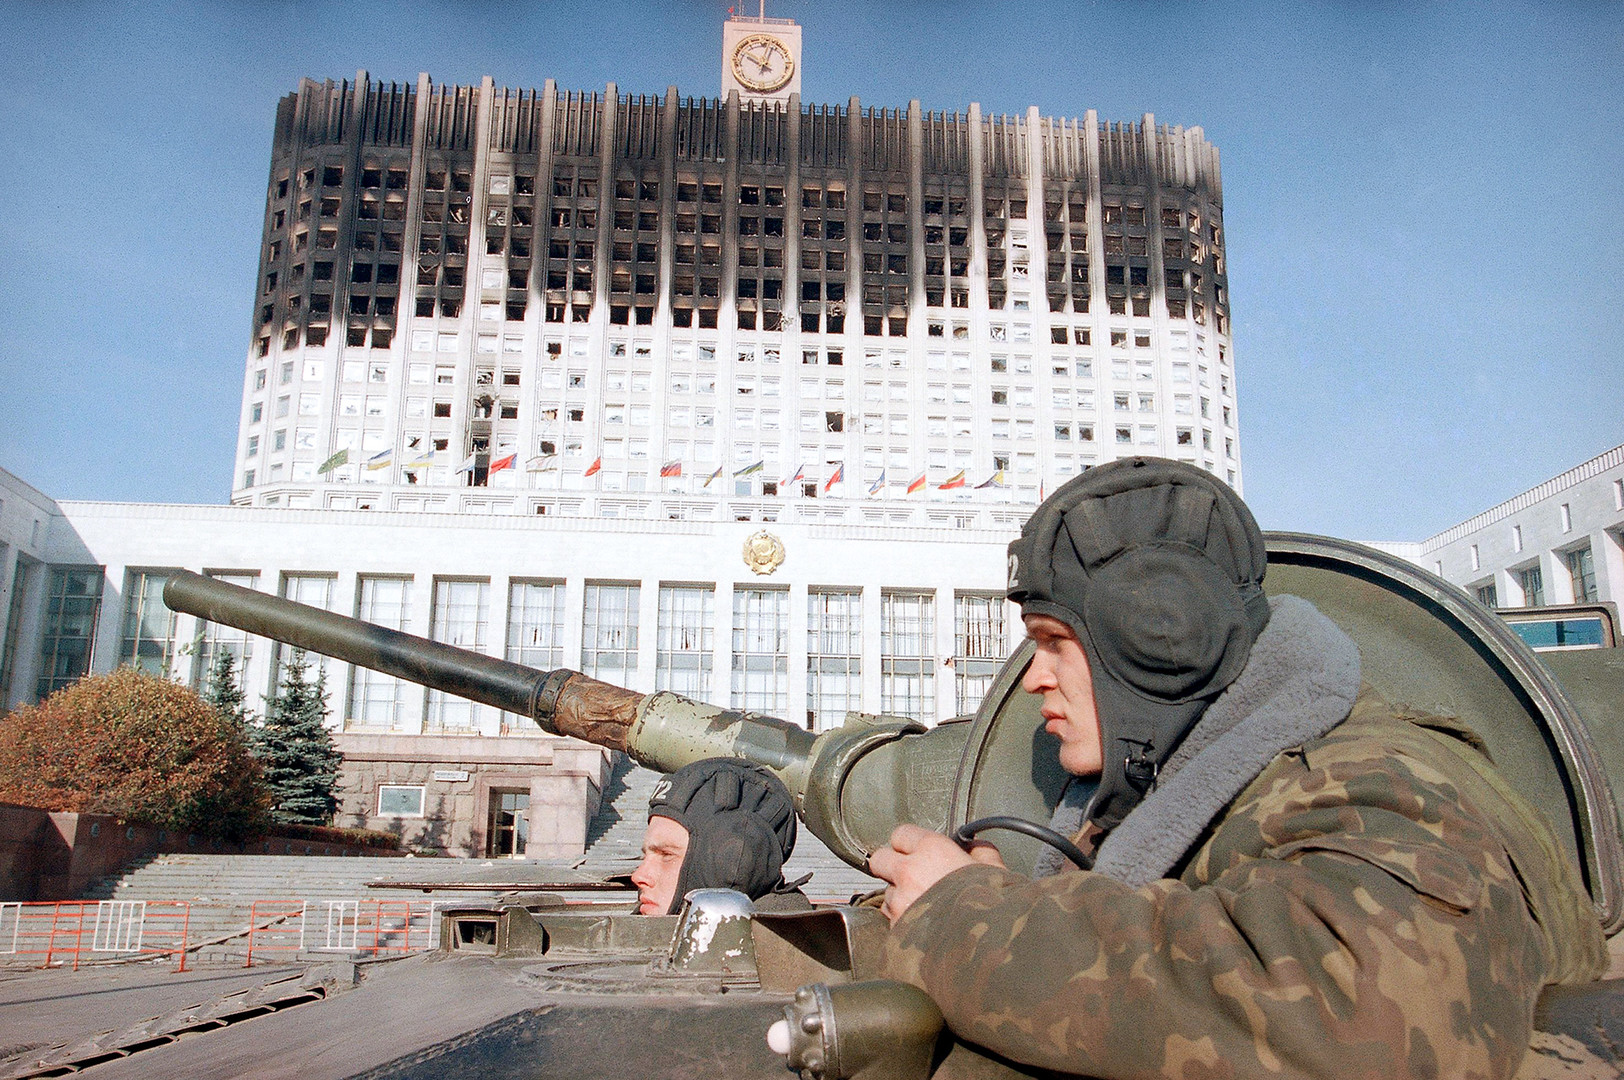 Militari davanti alla Casa Bianca di Mosca, 6 ottobre 1993